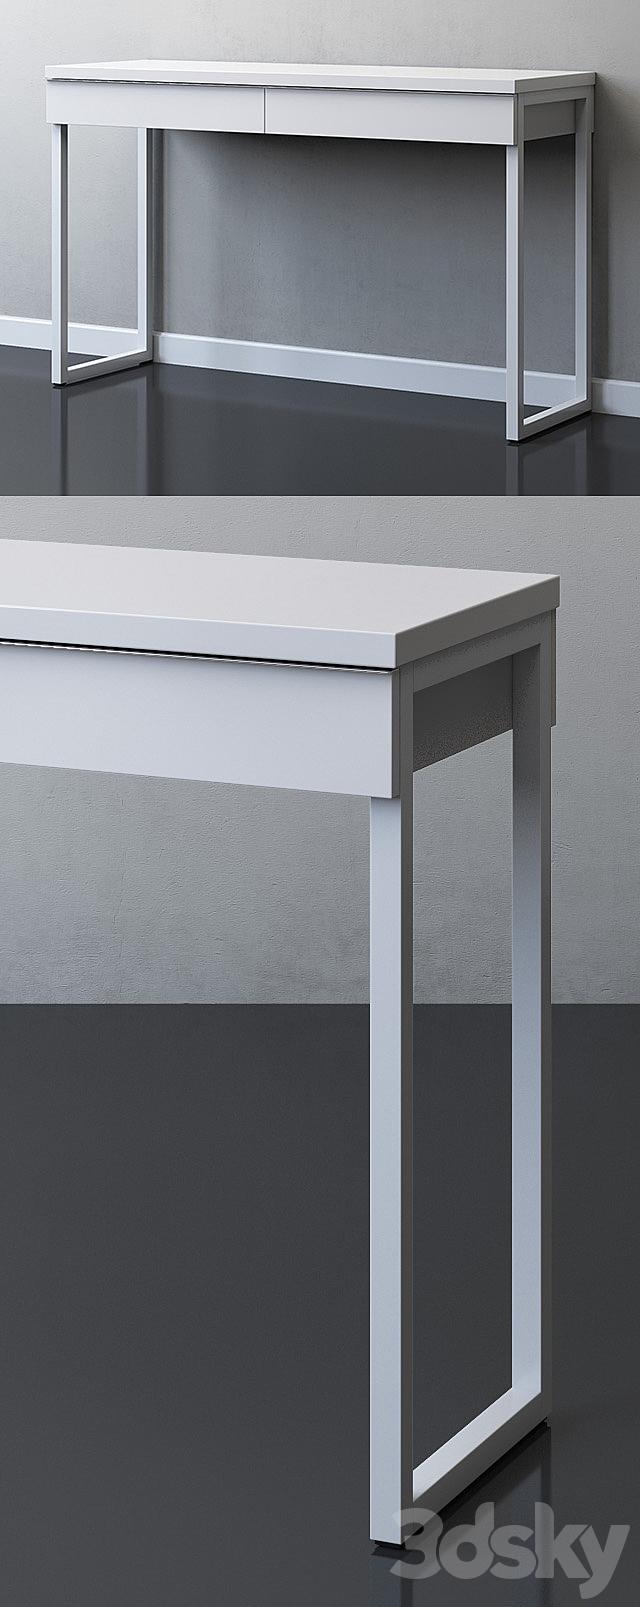 IKEA BESTA BURS Desk